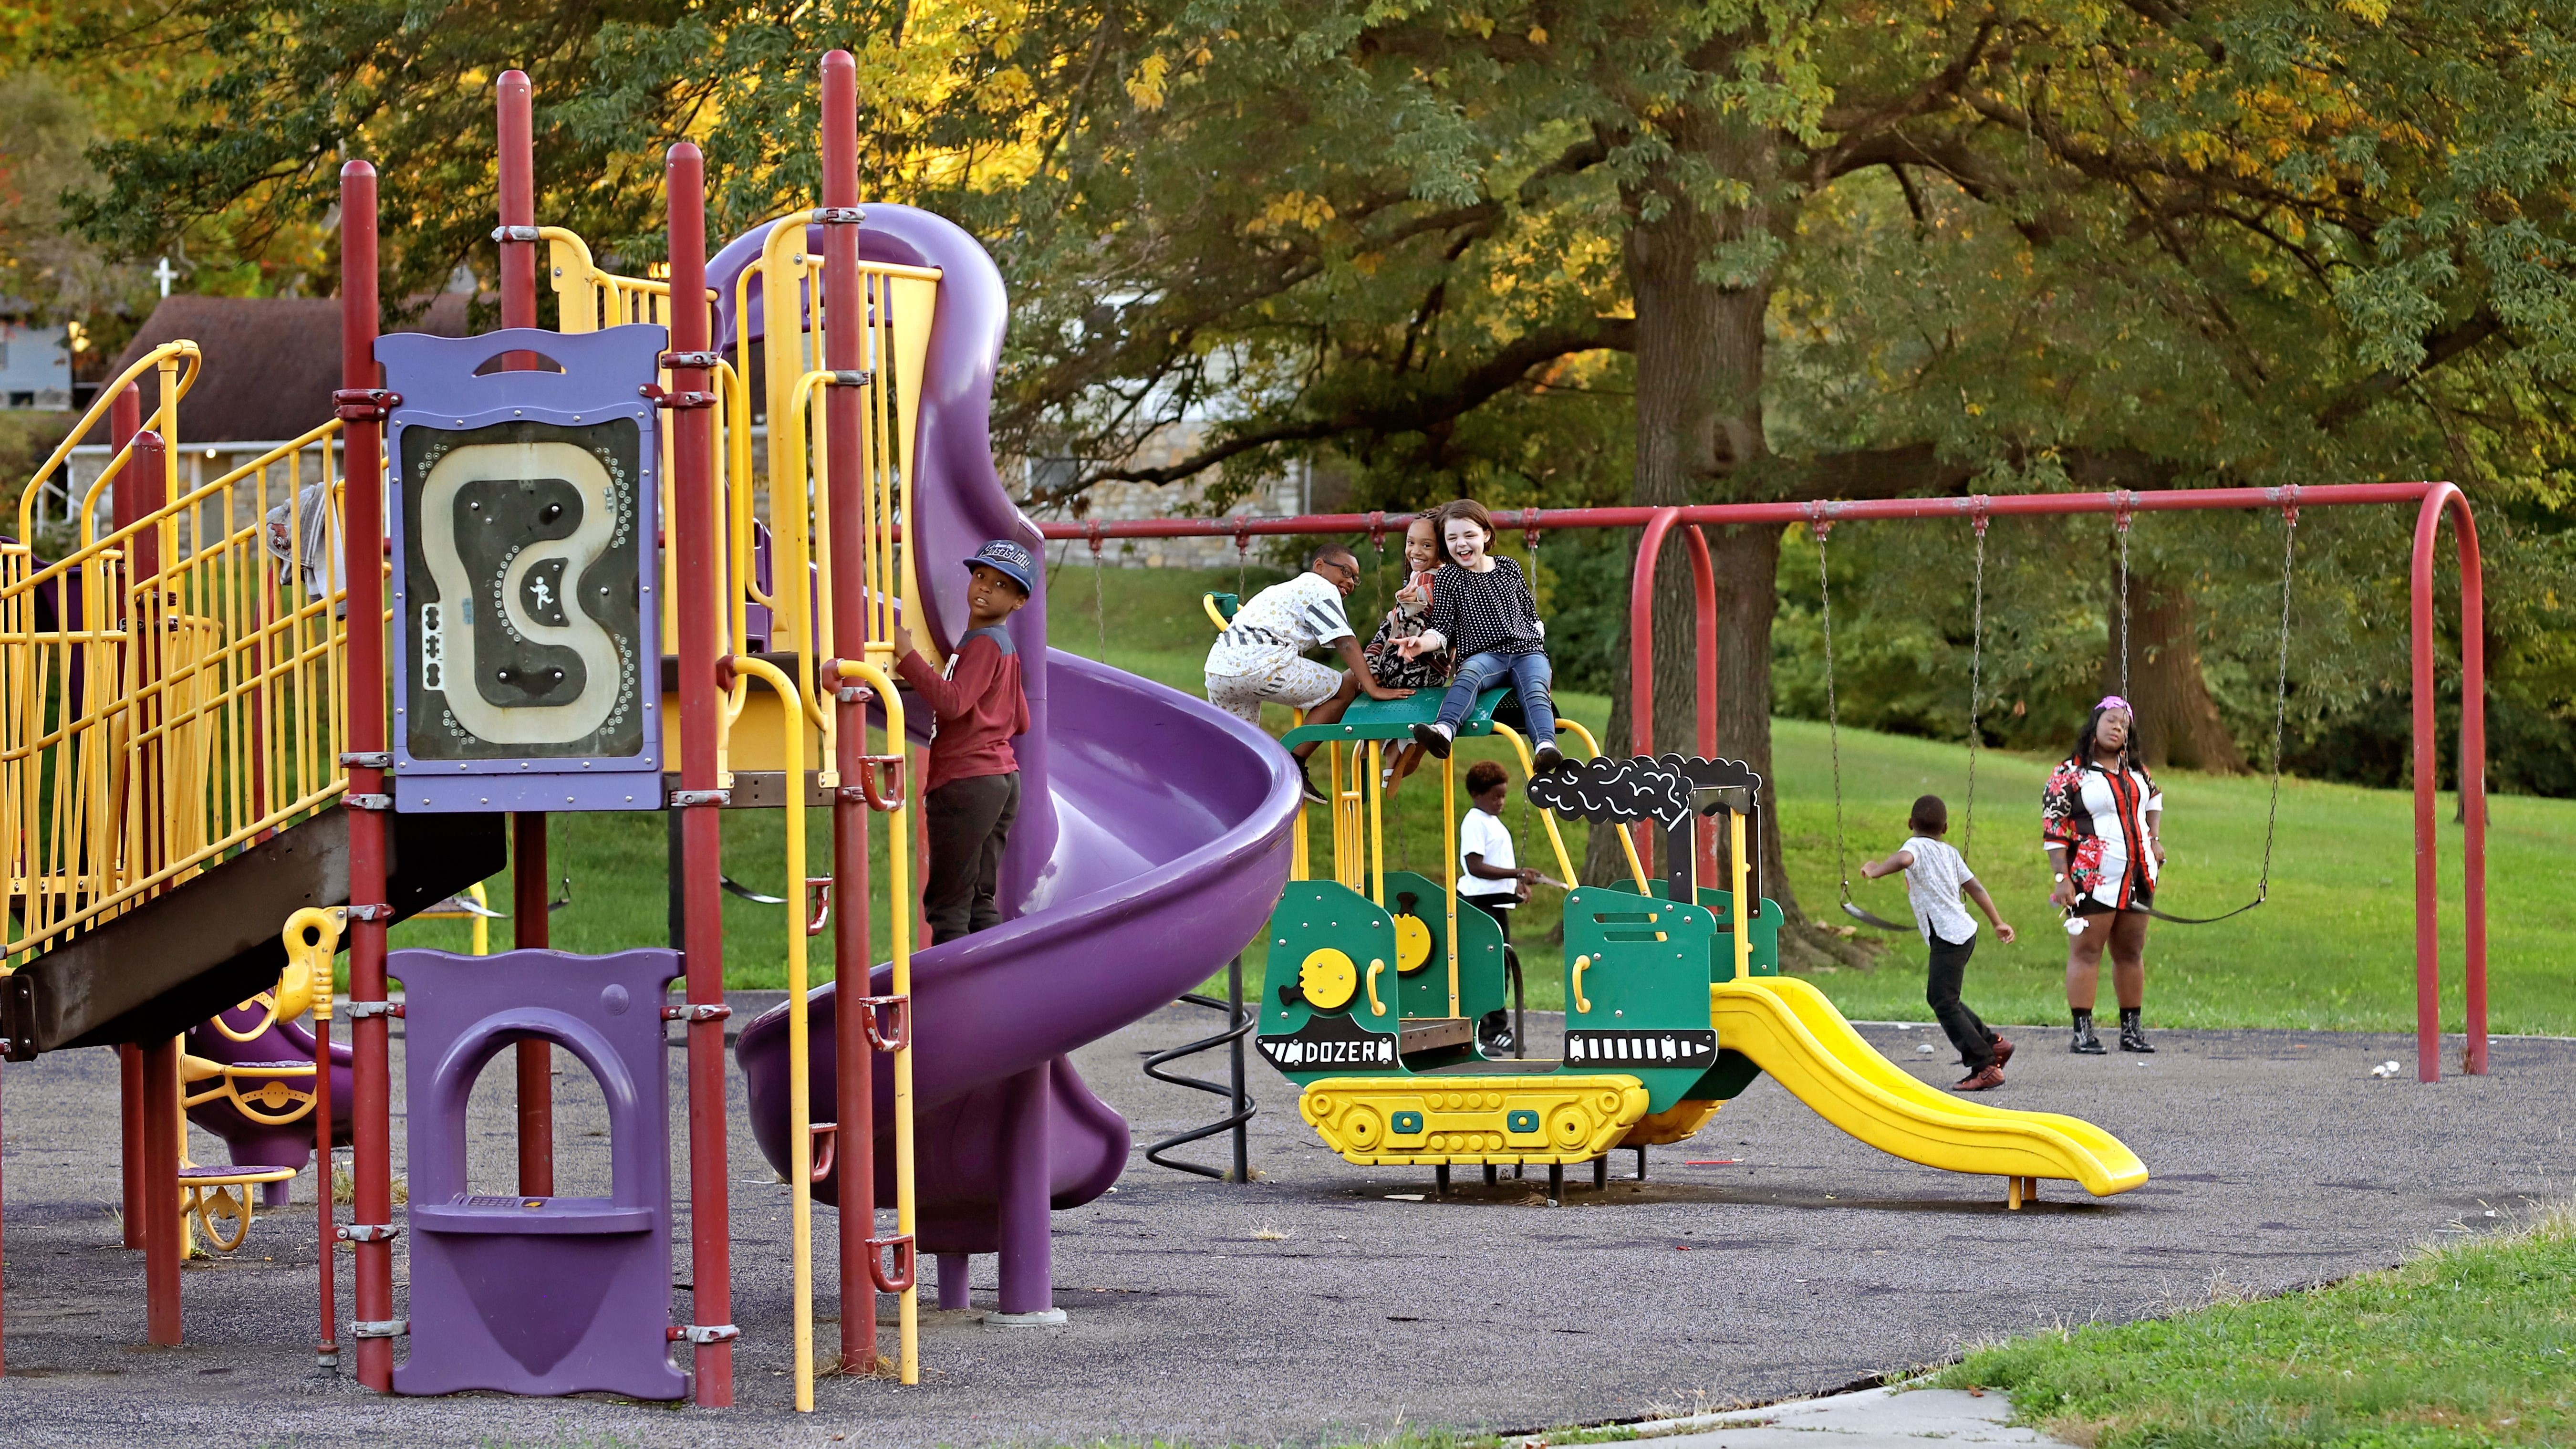 Ivanhoe Park